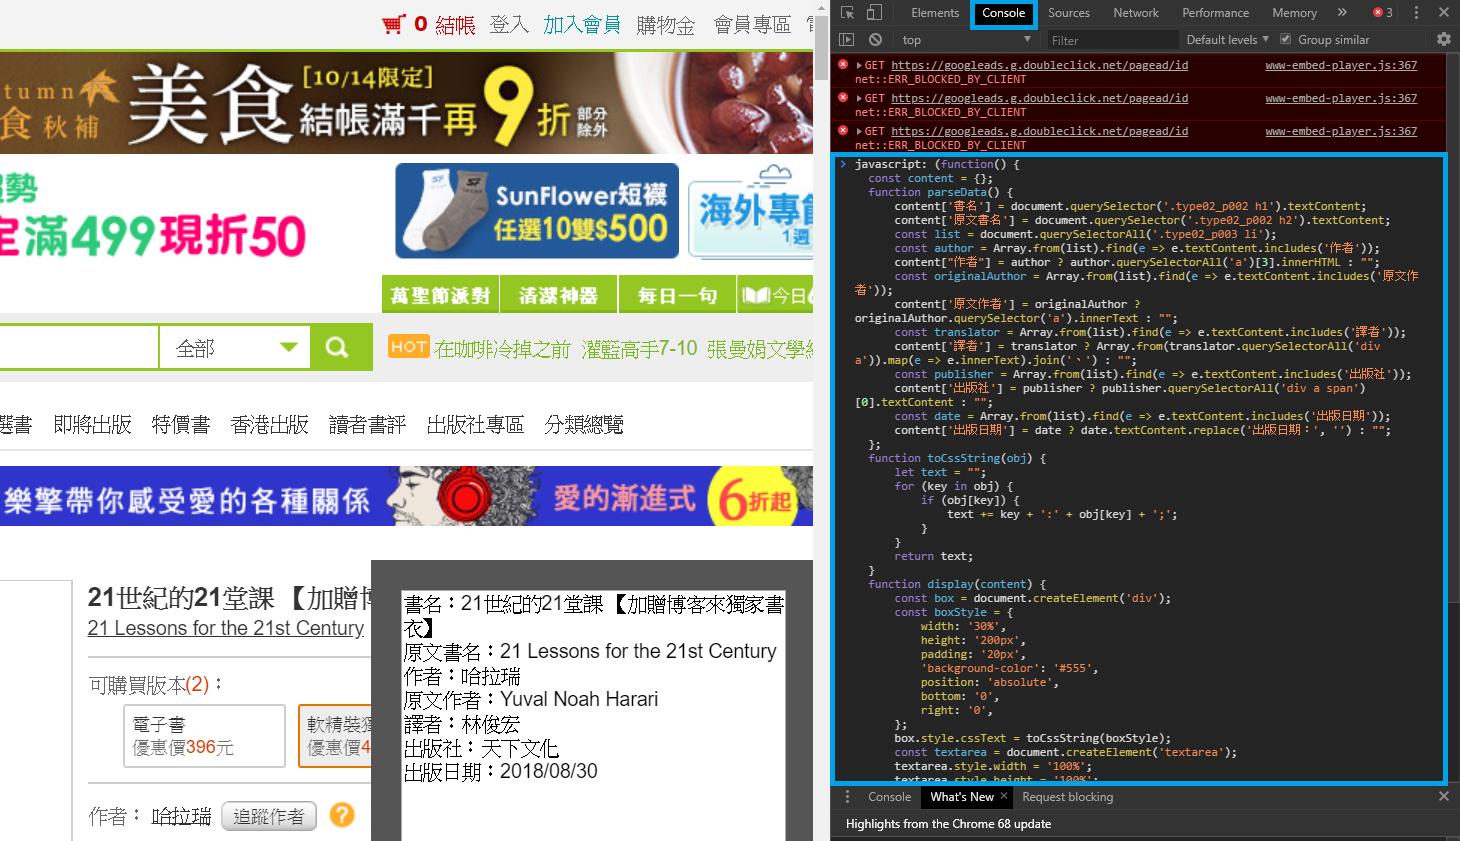 bookjs2 - 部落客、書評必備!透過 JavaScript 抓取並整理博客來書籍資料